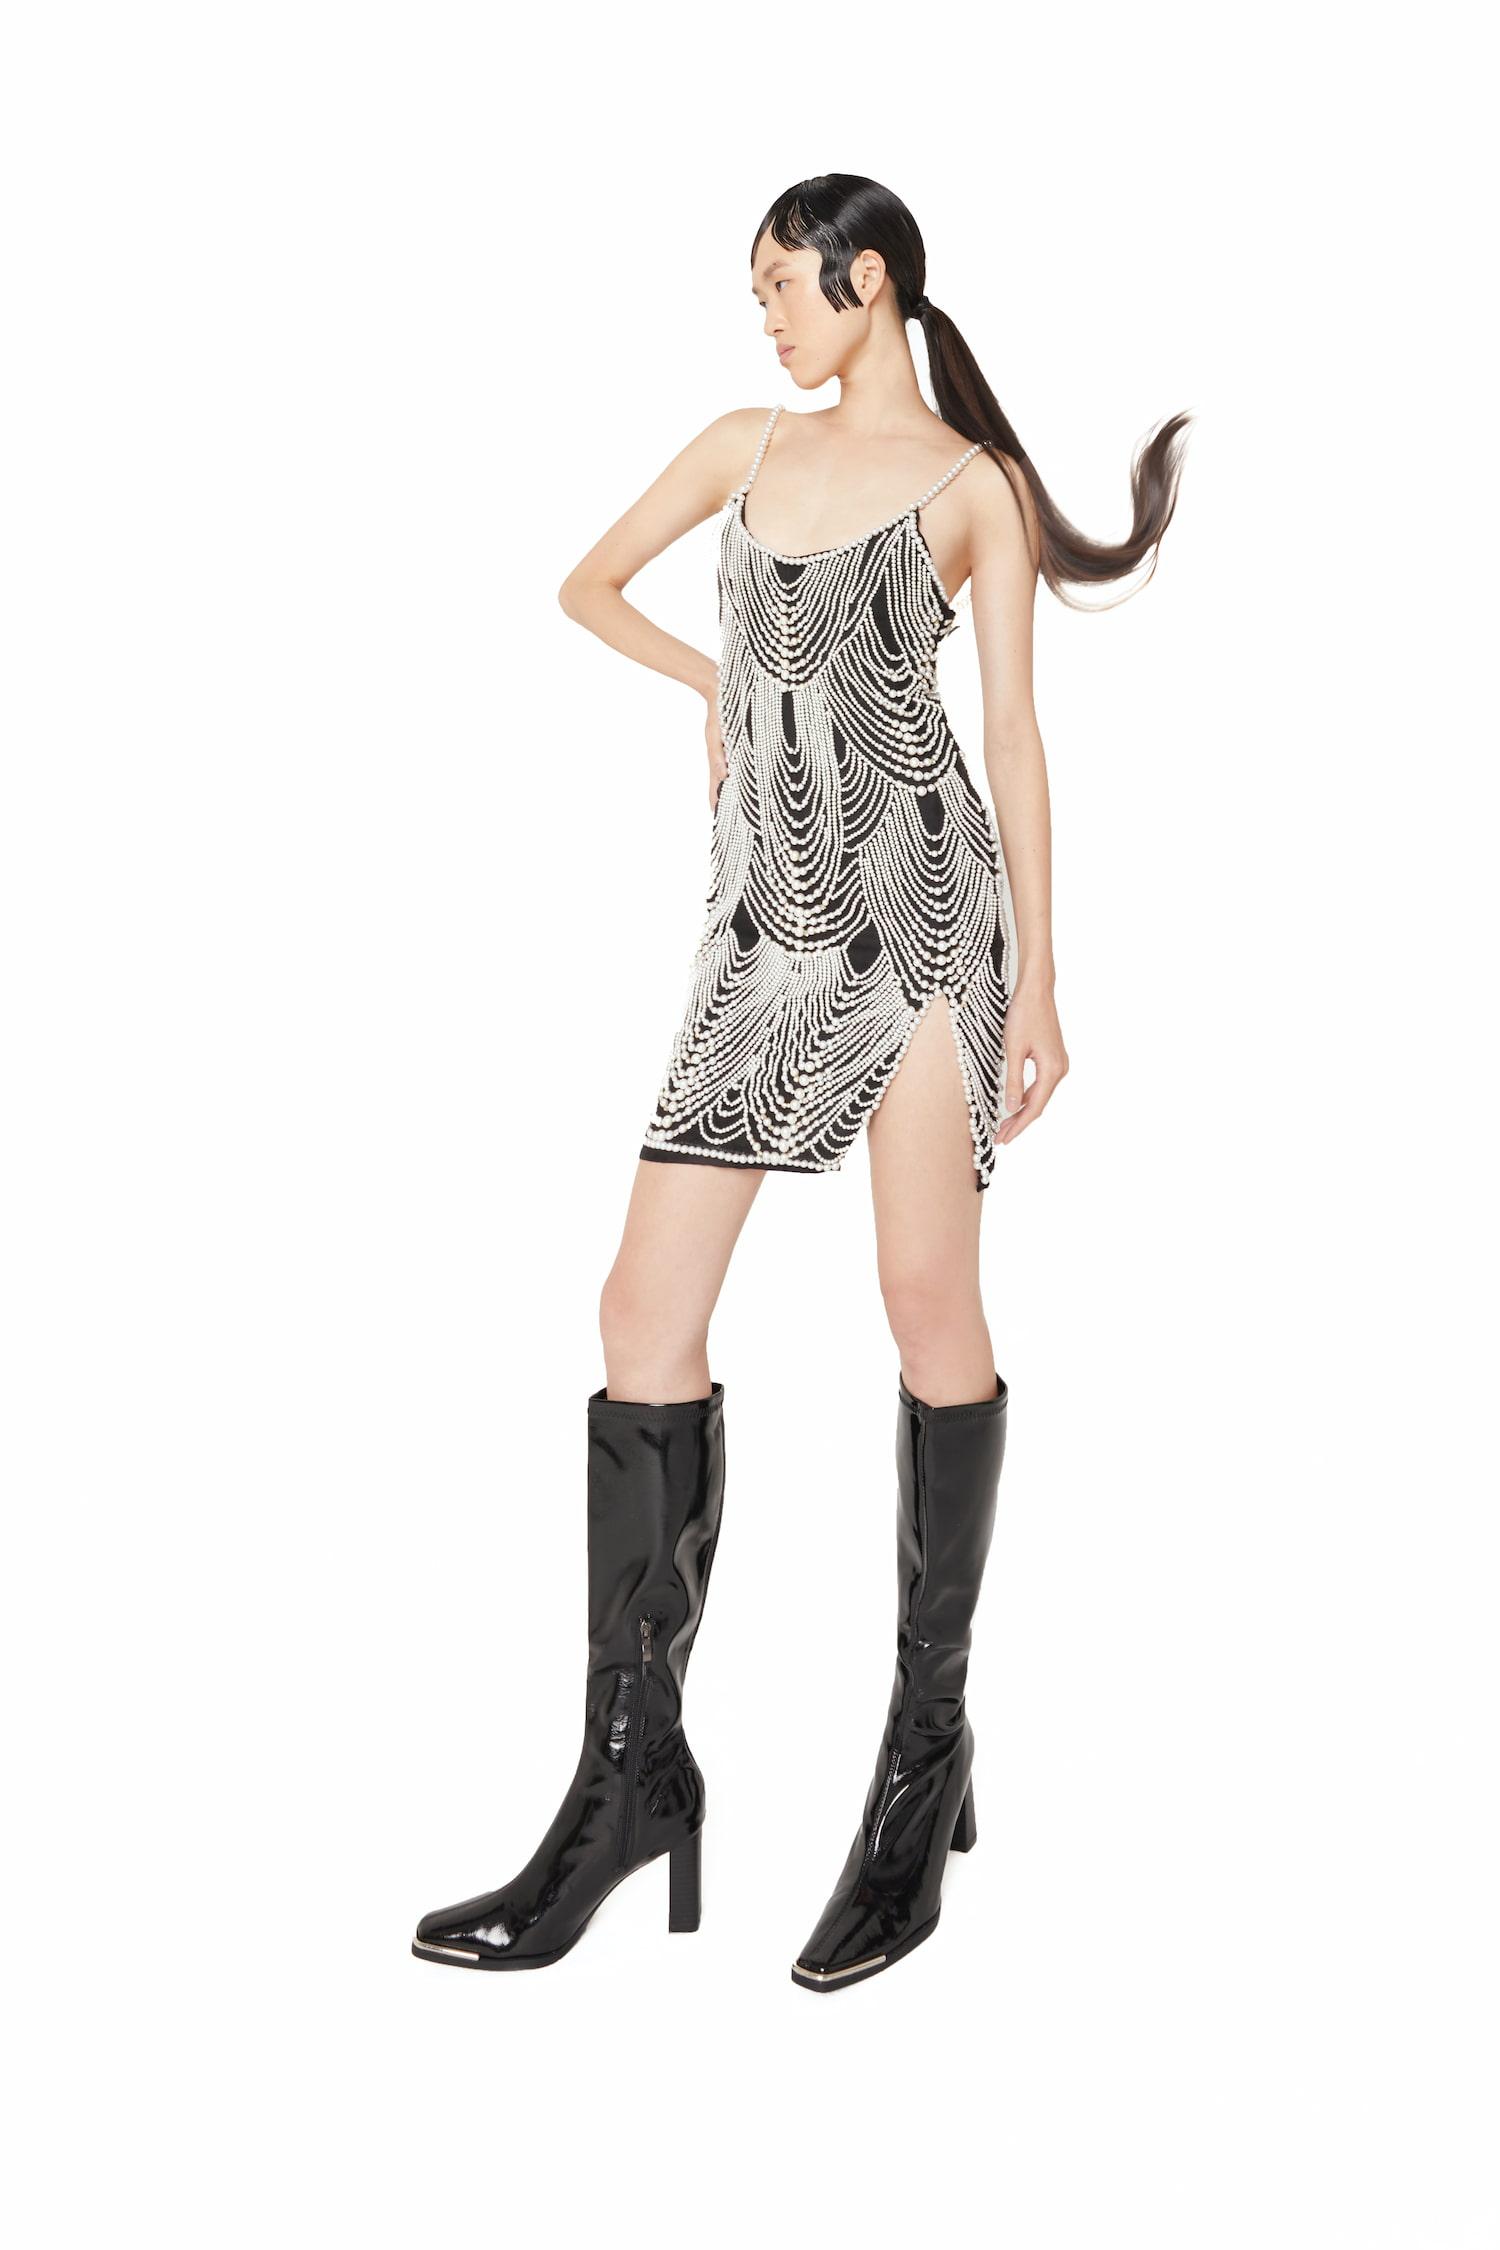 View 4 of model wearing Khha Mini Dress in black.